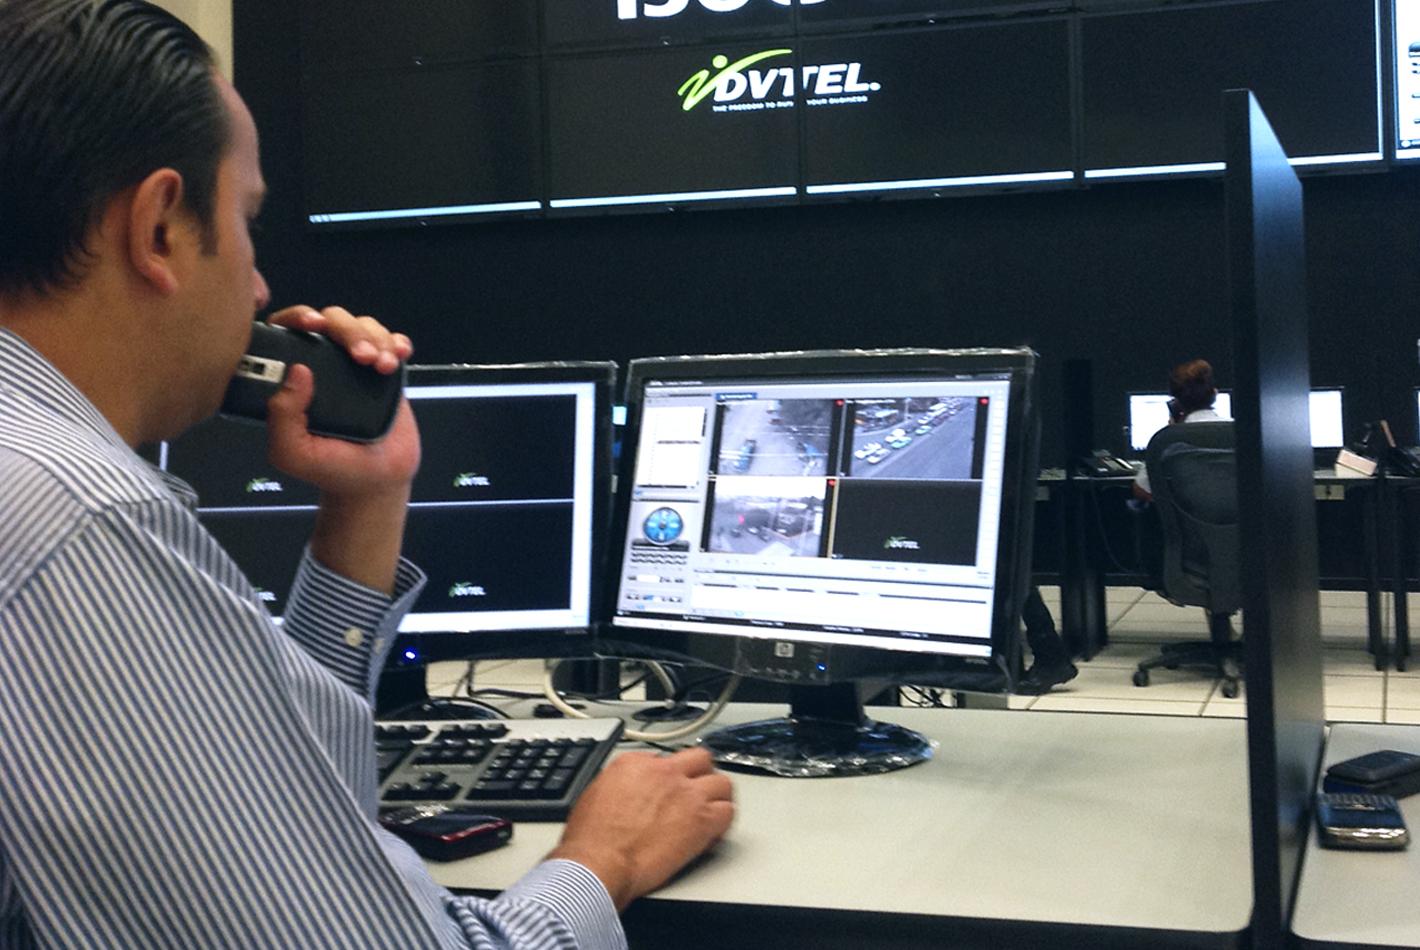 sistema-videovigilancia-gobierno-guanajuato